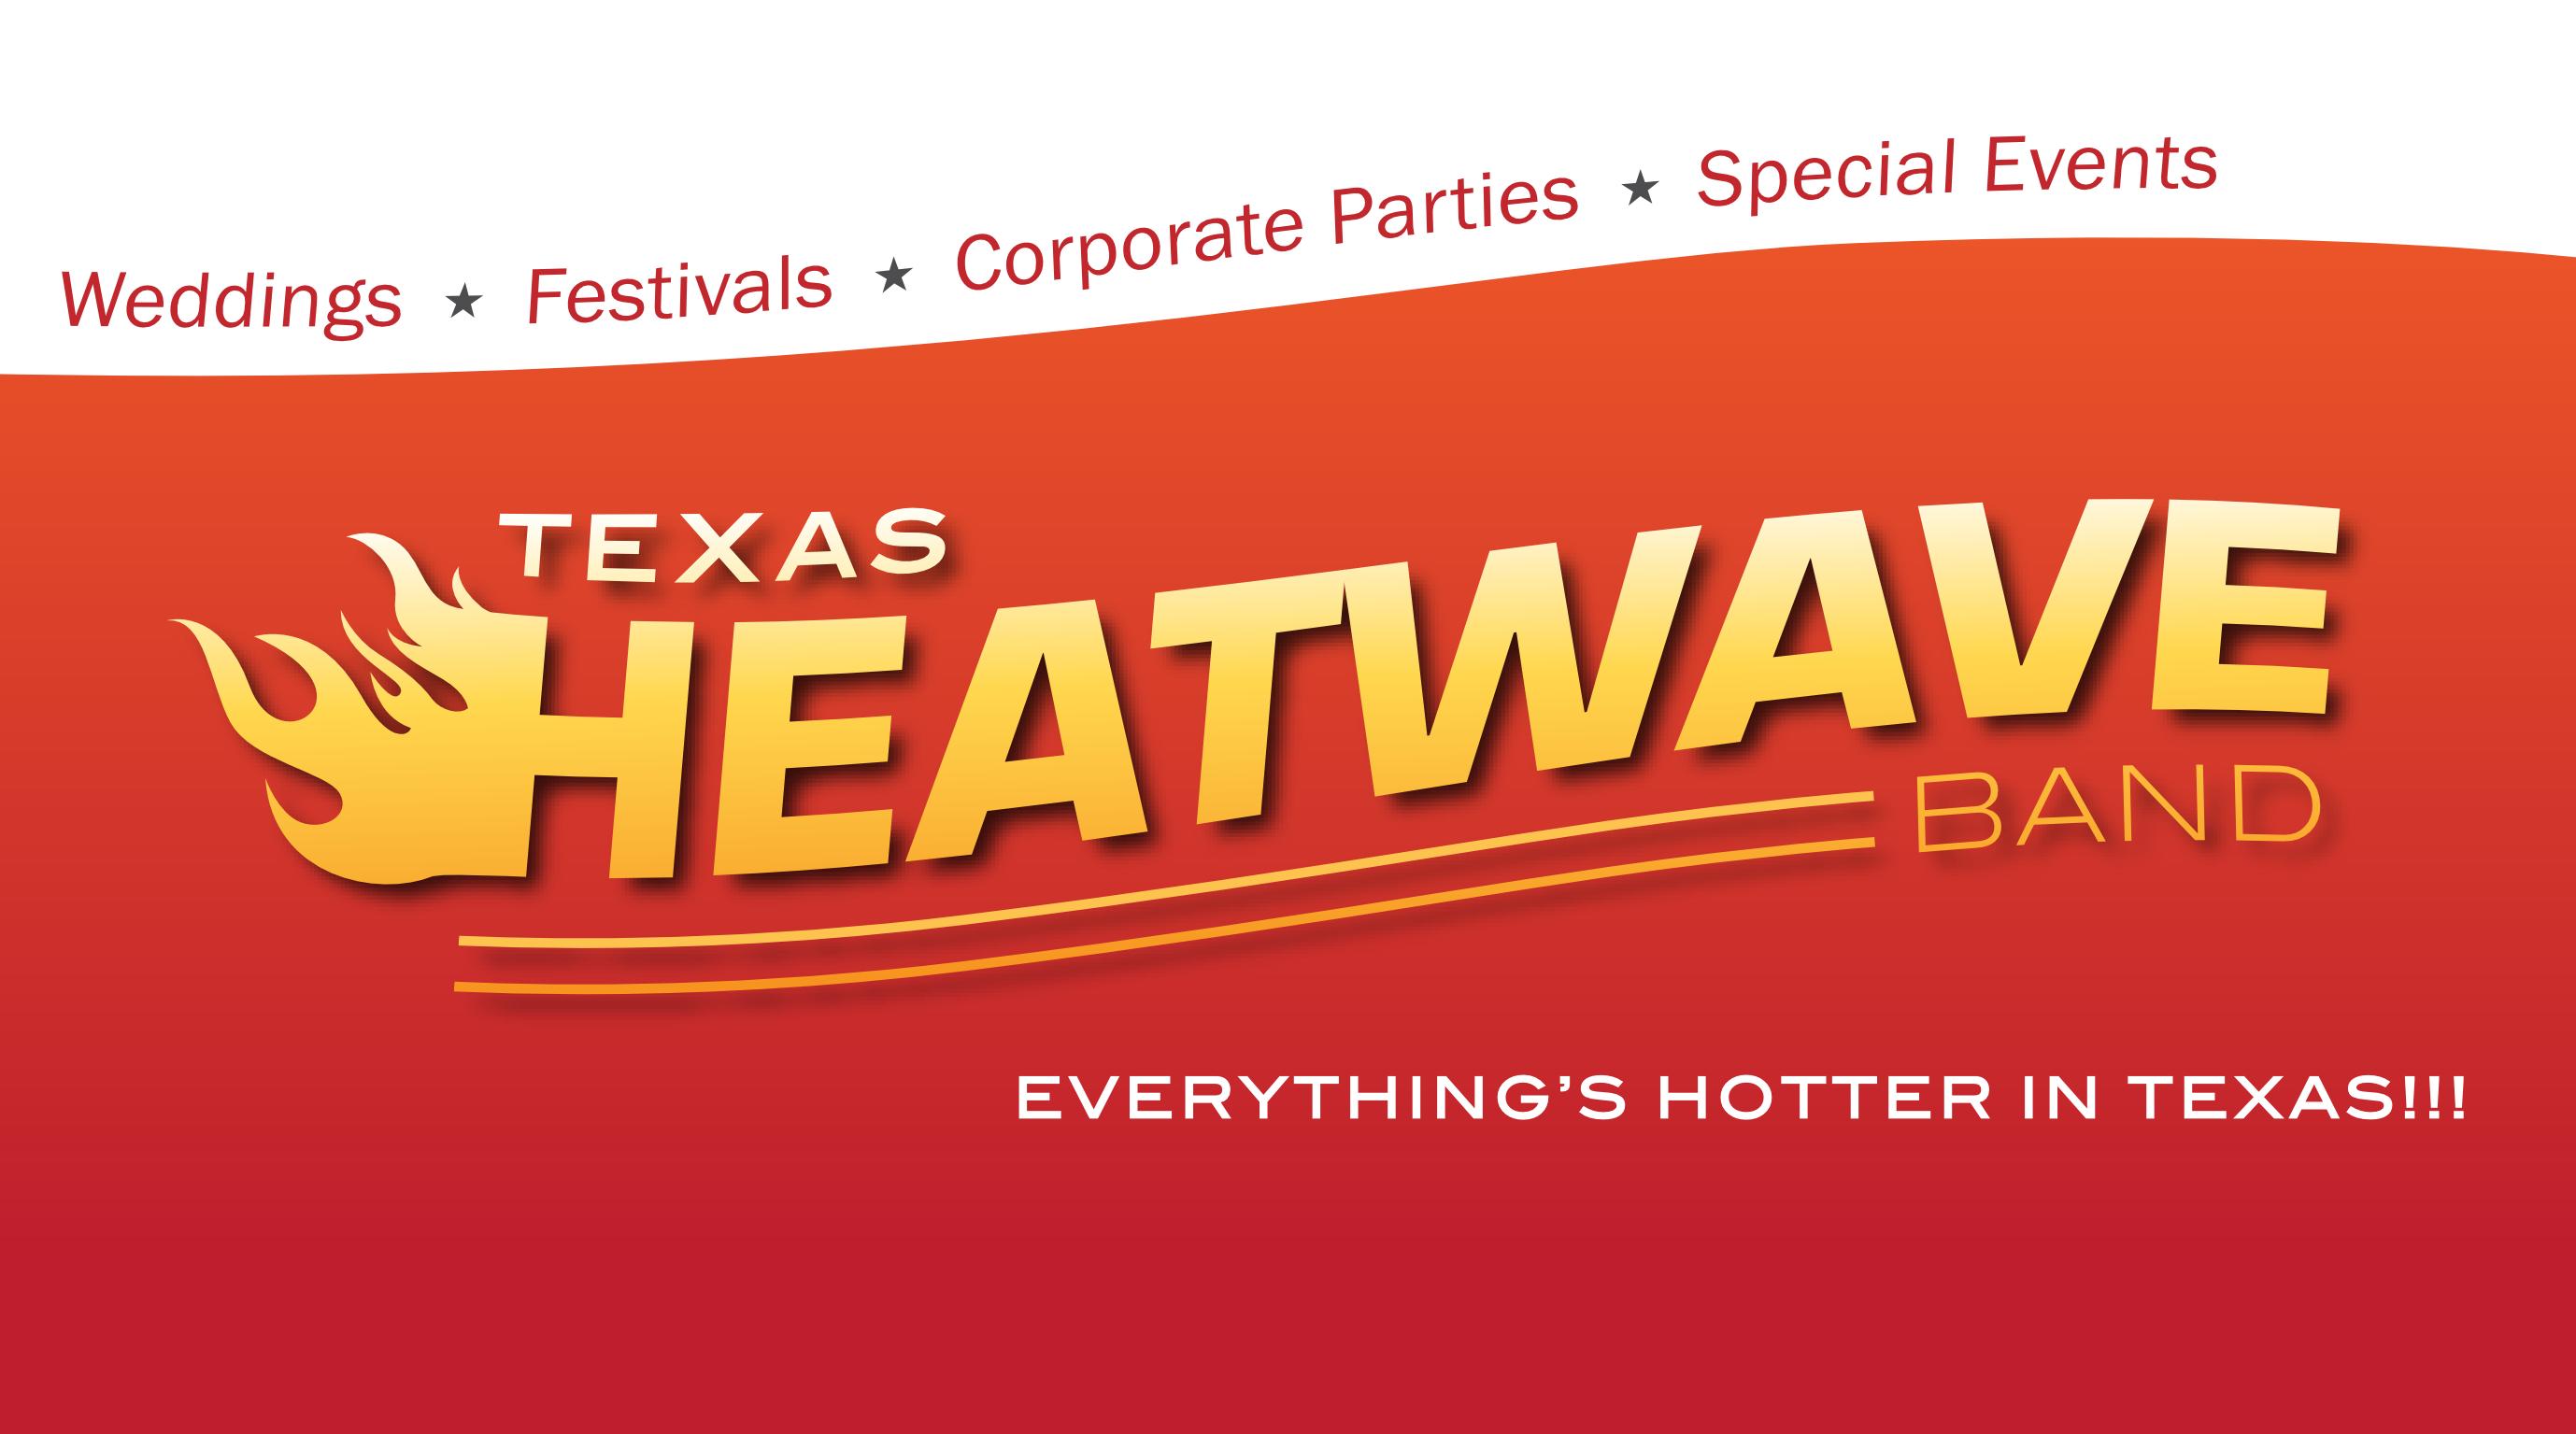 Texas Heatwave Band